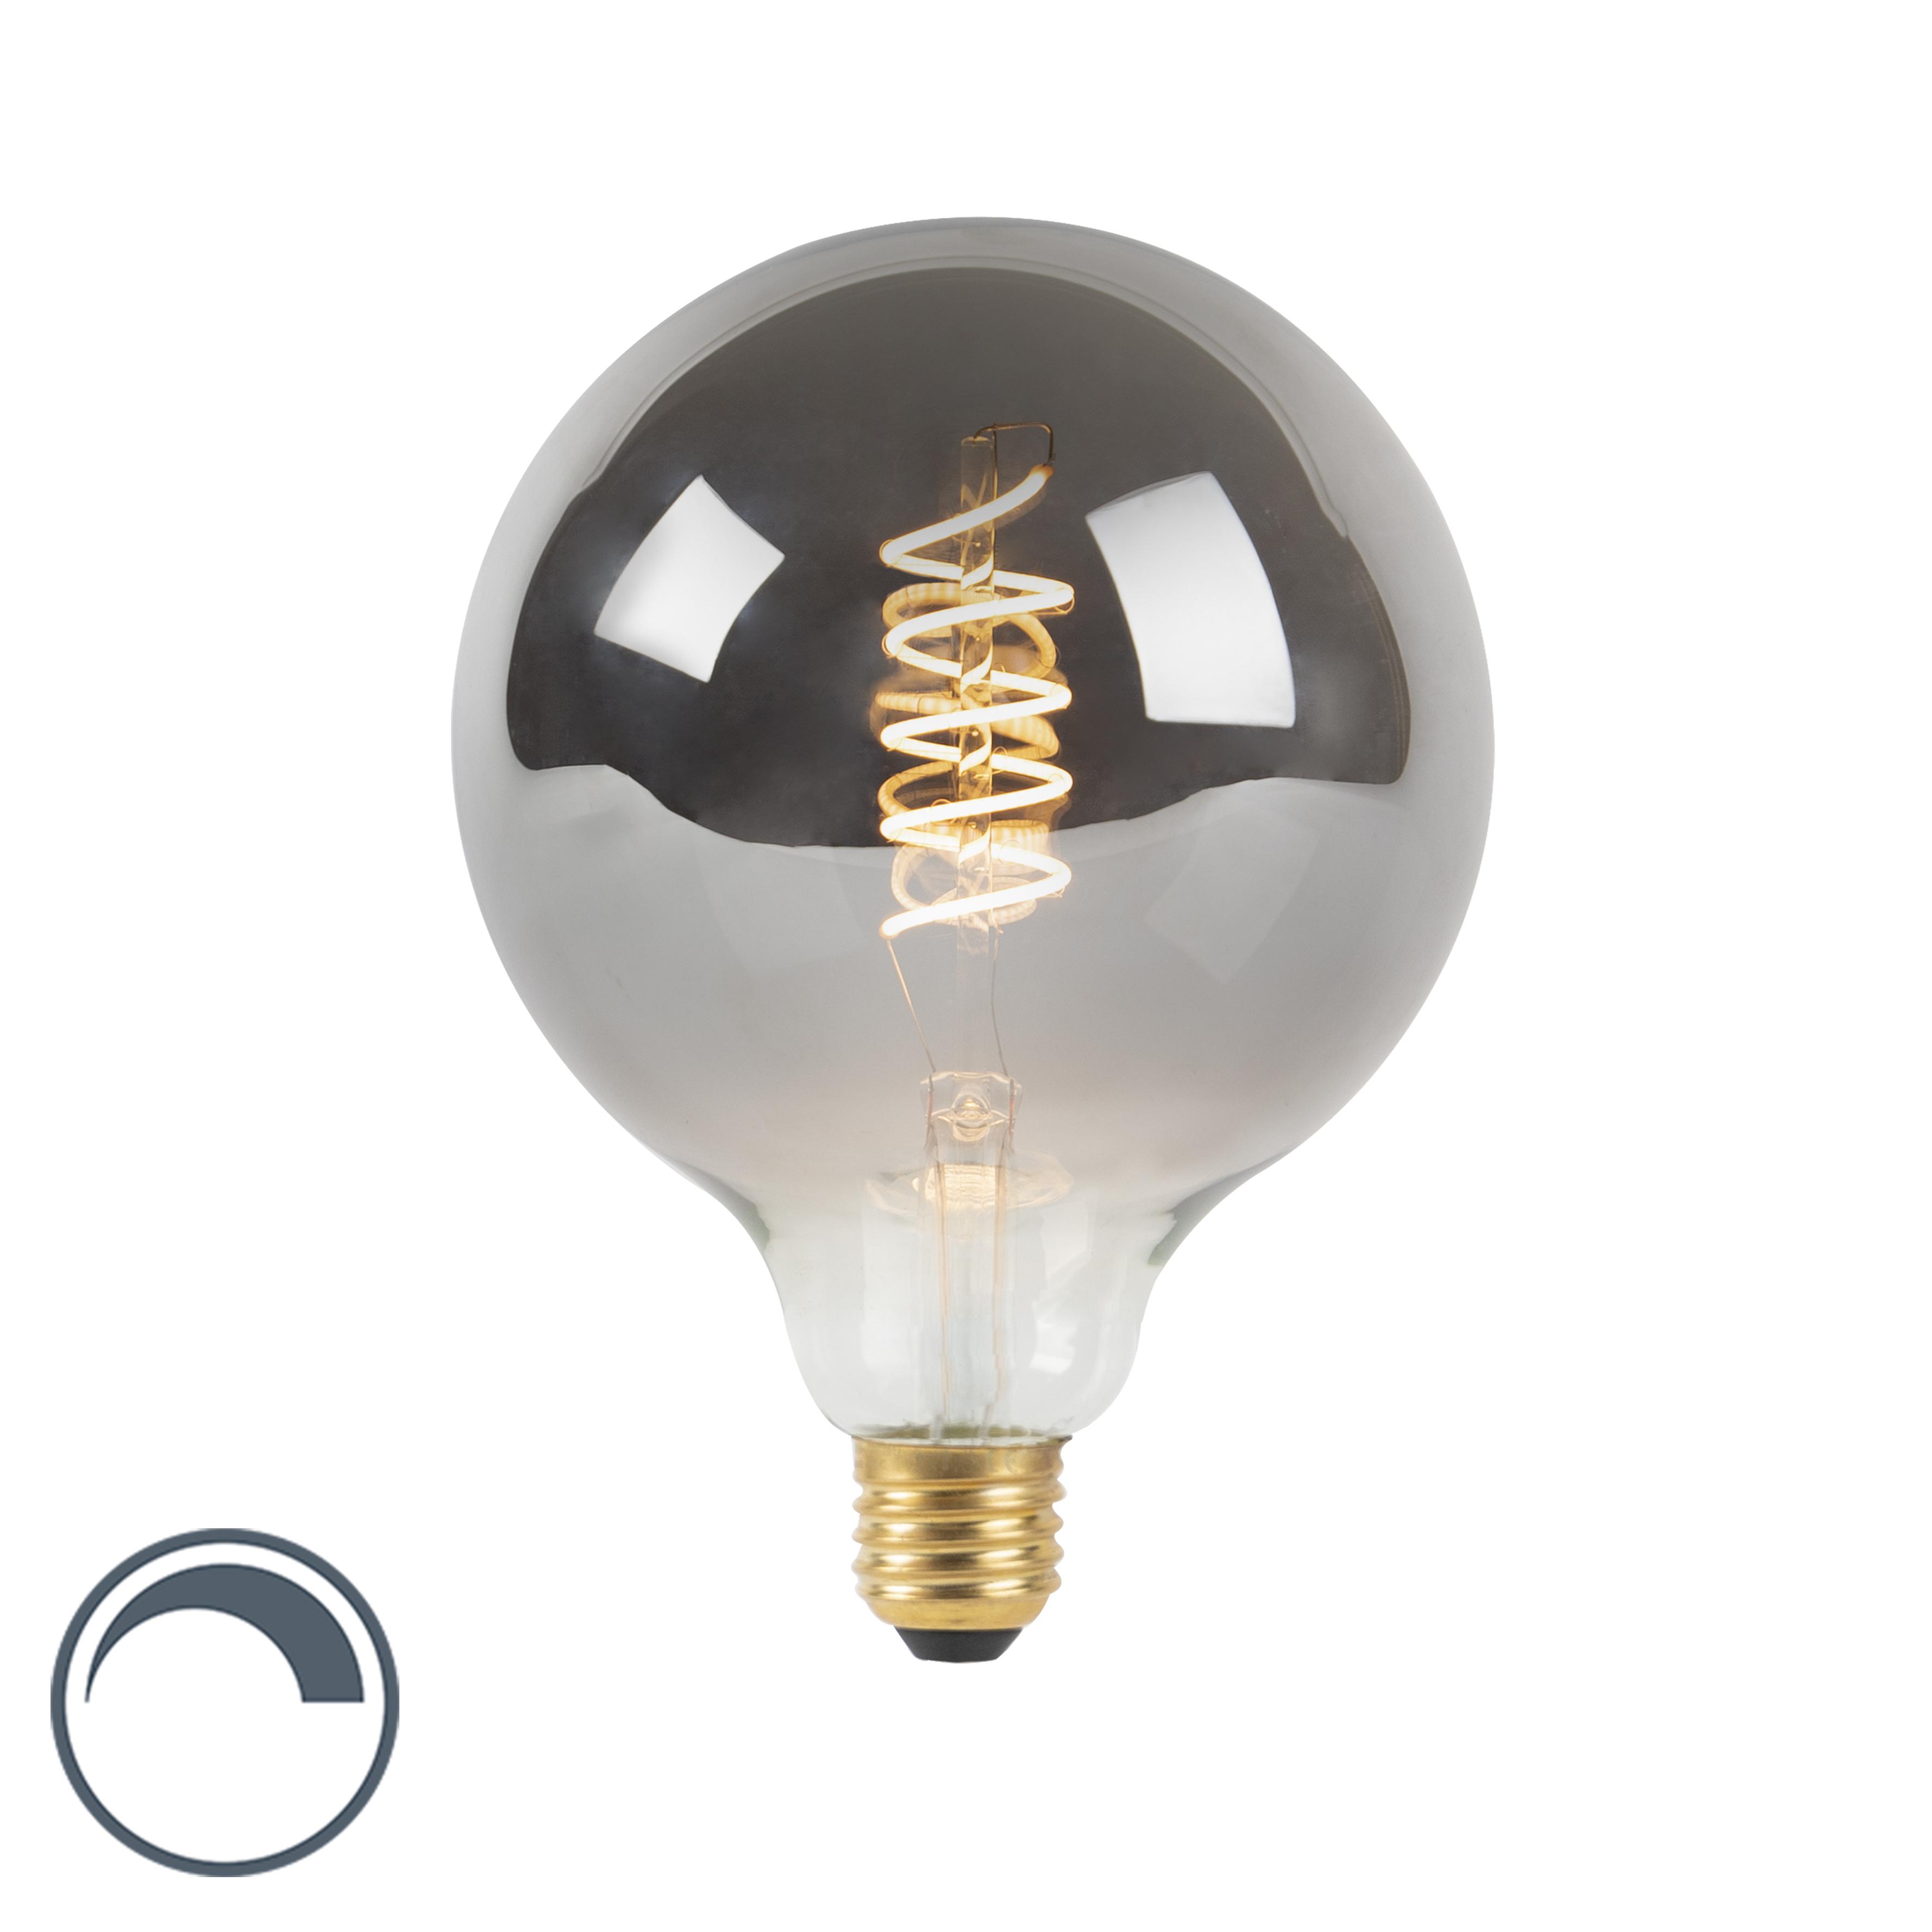 E27 dimmbare LED-Glühlampe Rauch 4W 100 lm 2100K | Lampen > Leuchtmittel > Mehr-Leuchtmittel | LUEDD